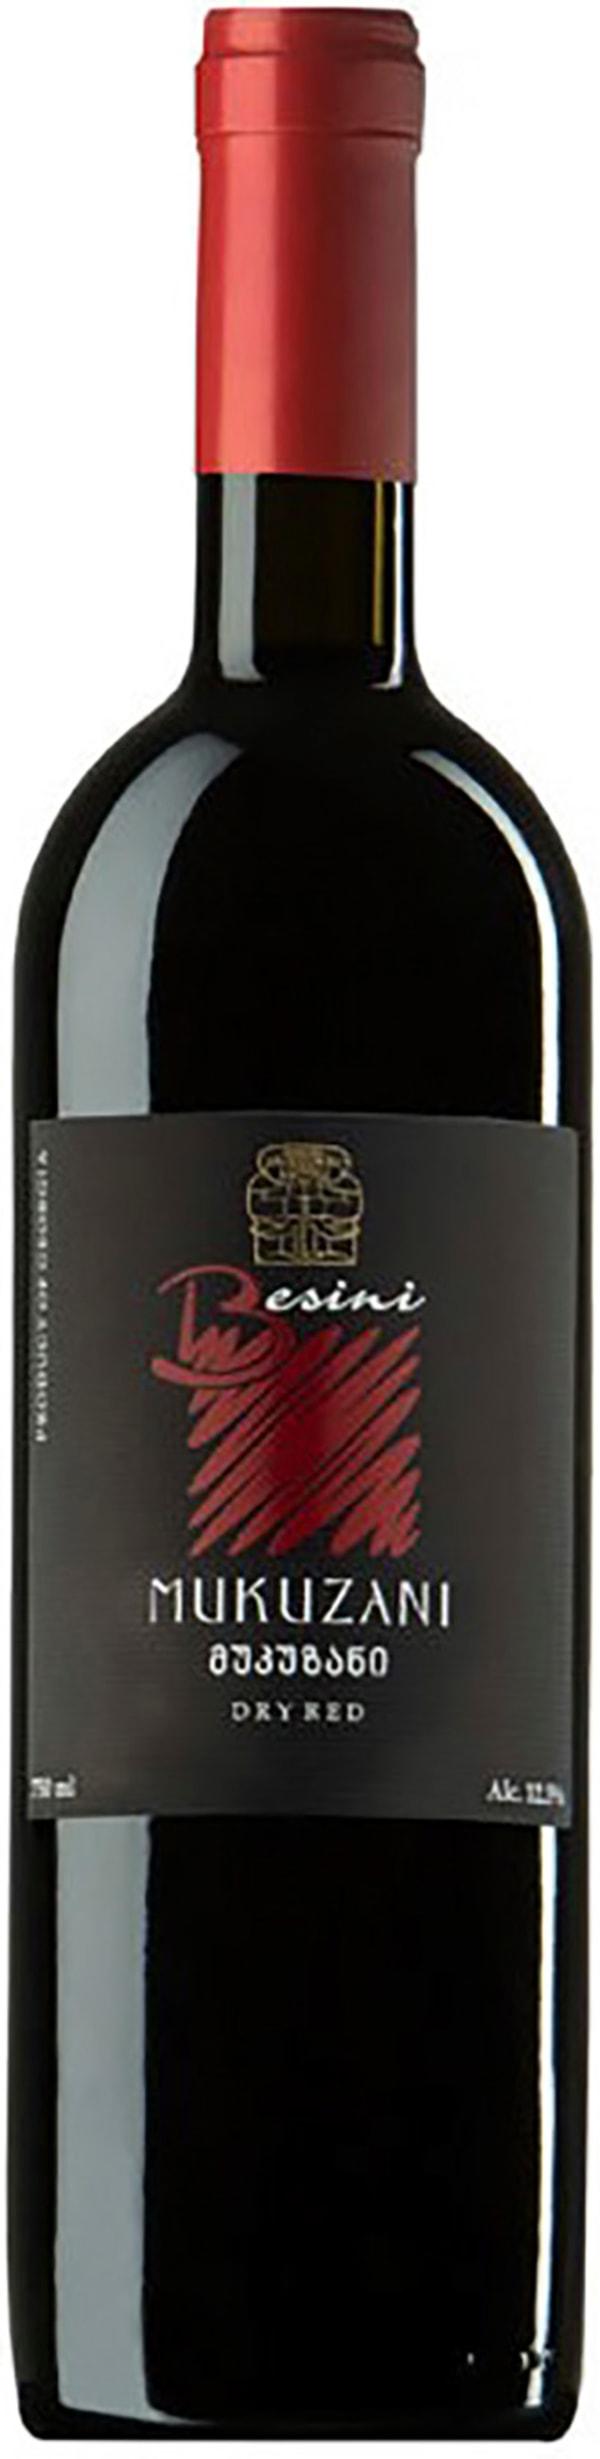 Red wine, dry, medium dry, medium sweet in Helsinki